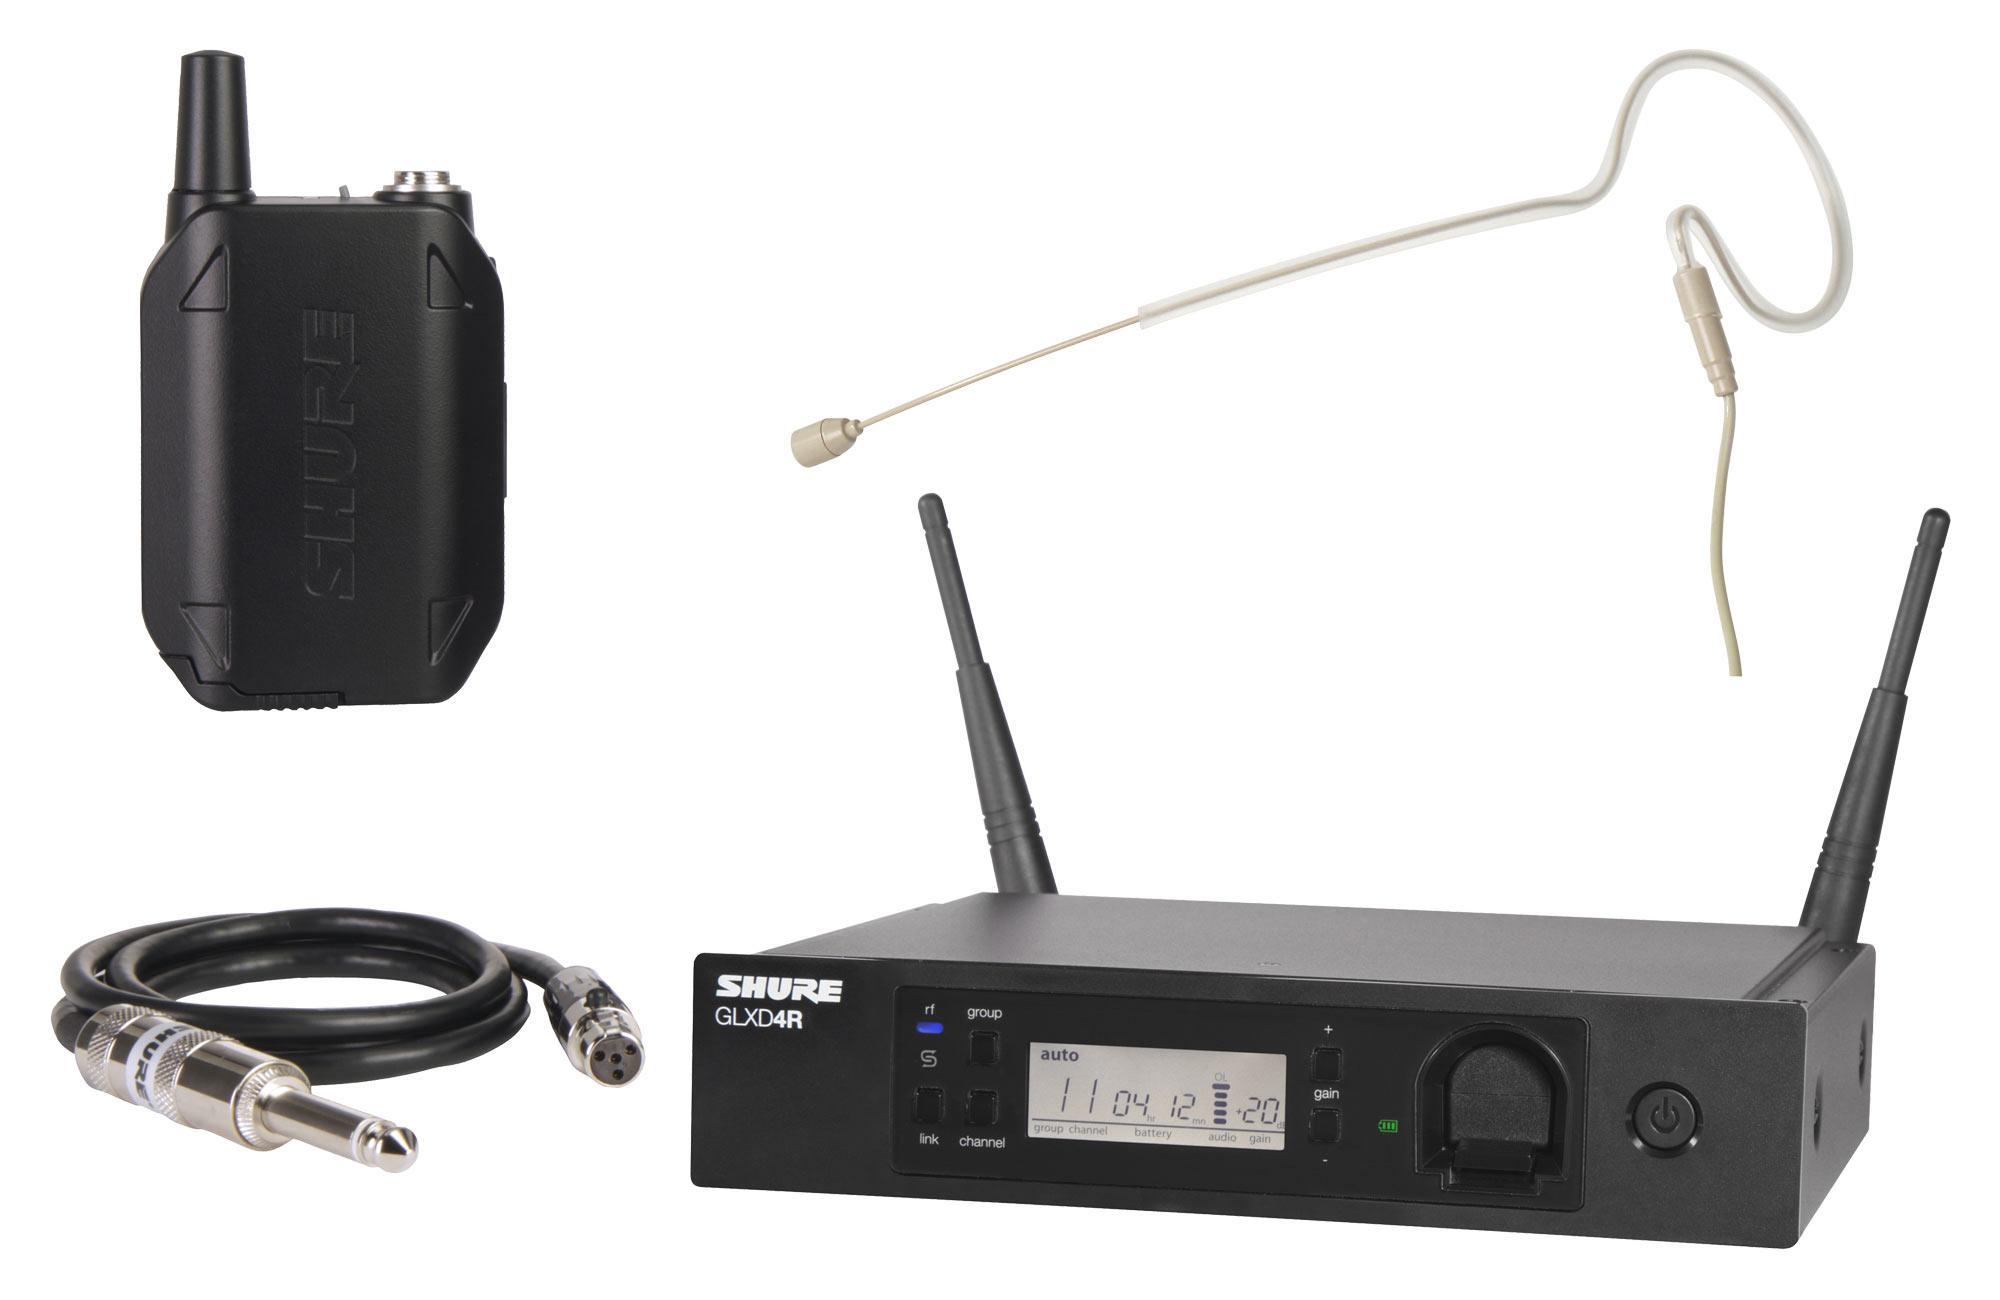 Shure GLXD14R Digital Funksystem Set inkl. HS 11 Headsetmikrofon